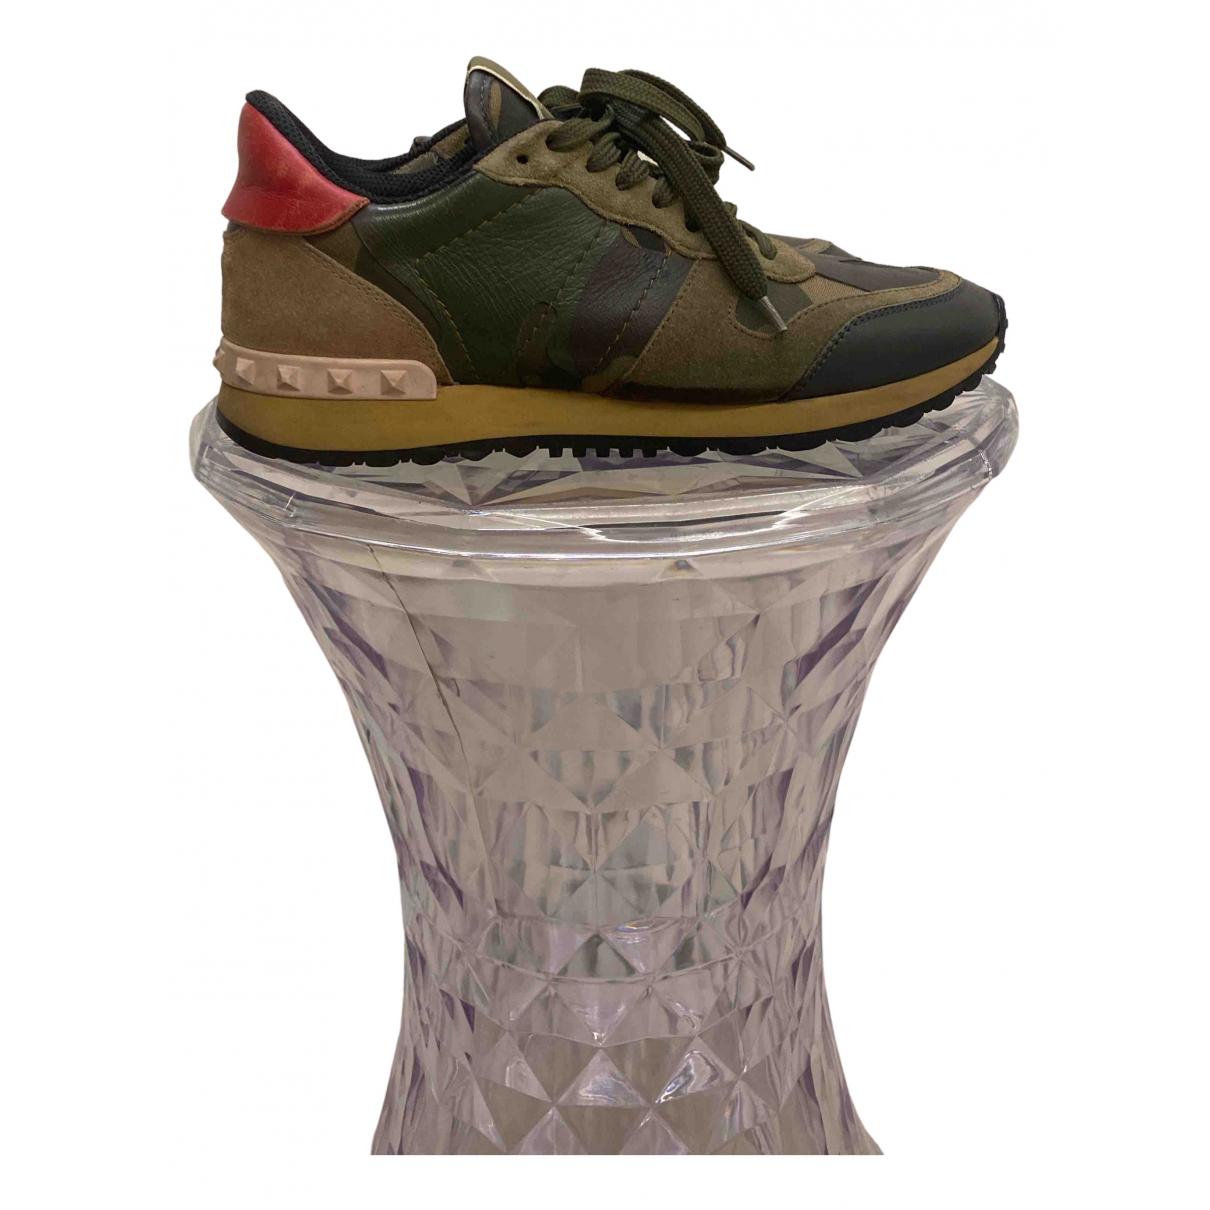 Valentino Garavani - Baskets Rockrunner pour femme en cuir - kaki